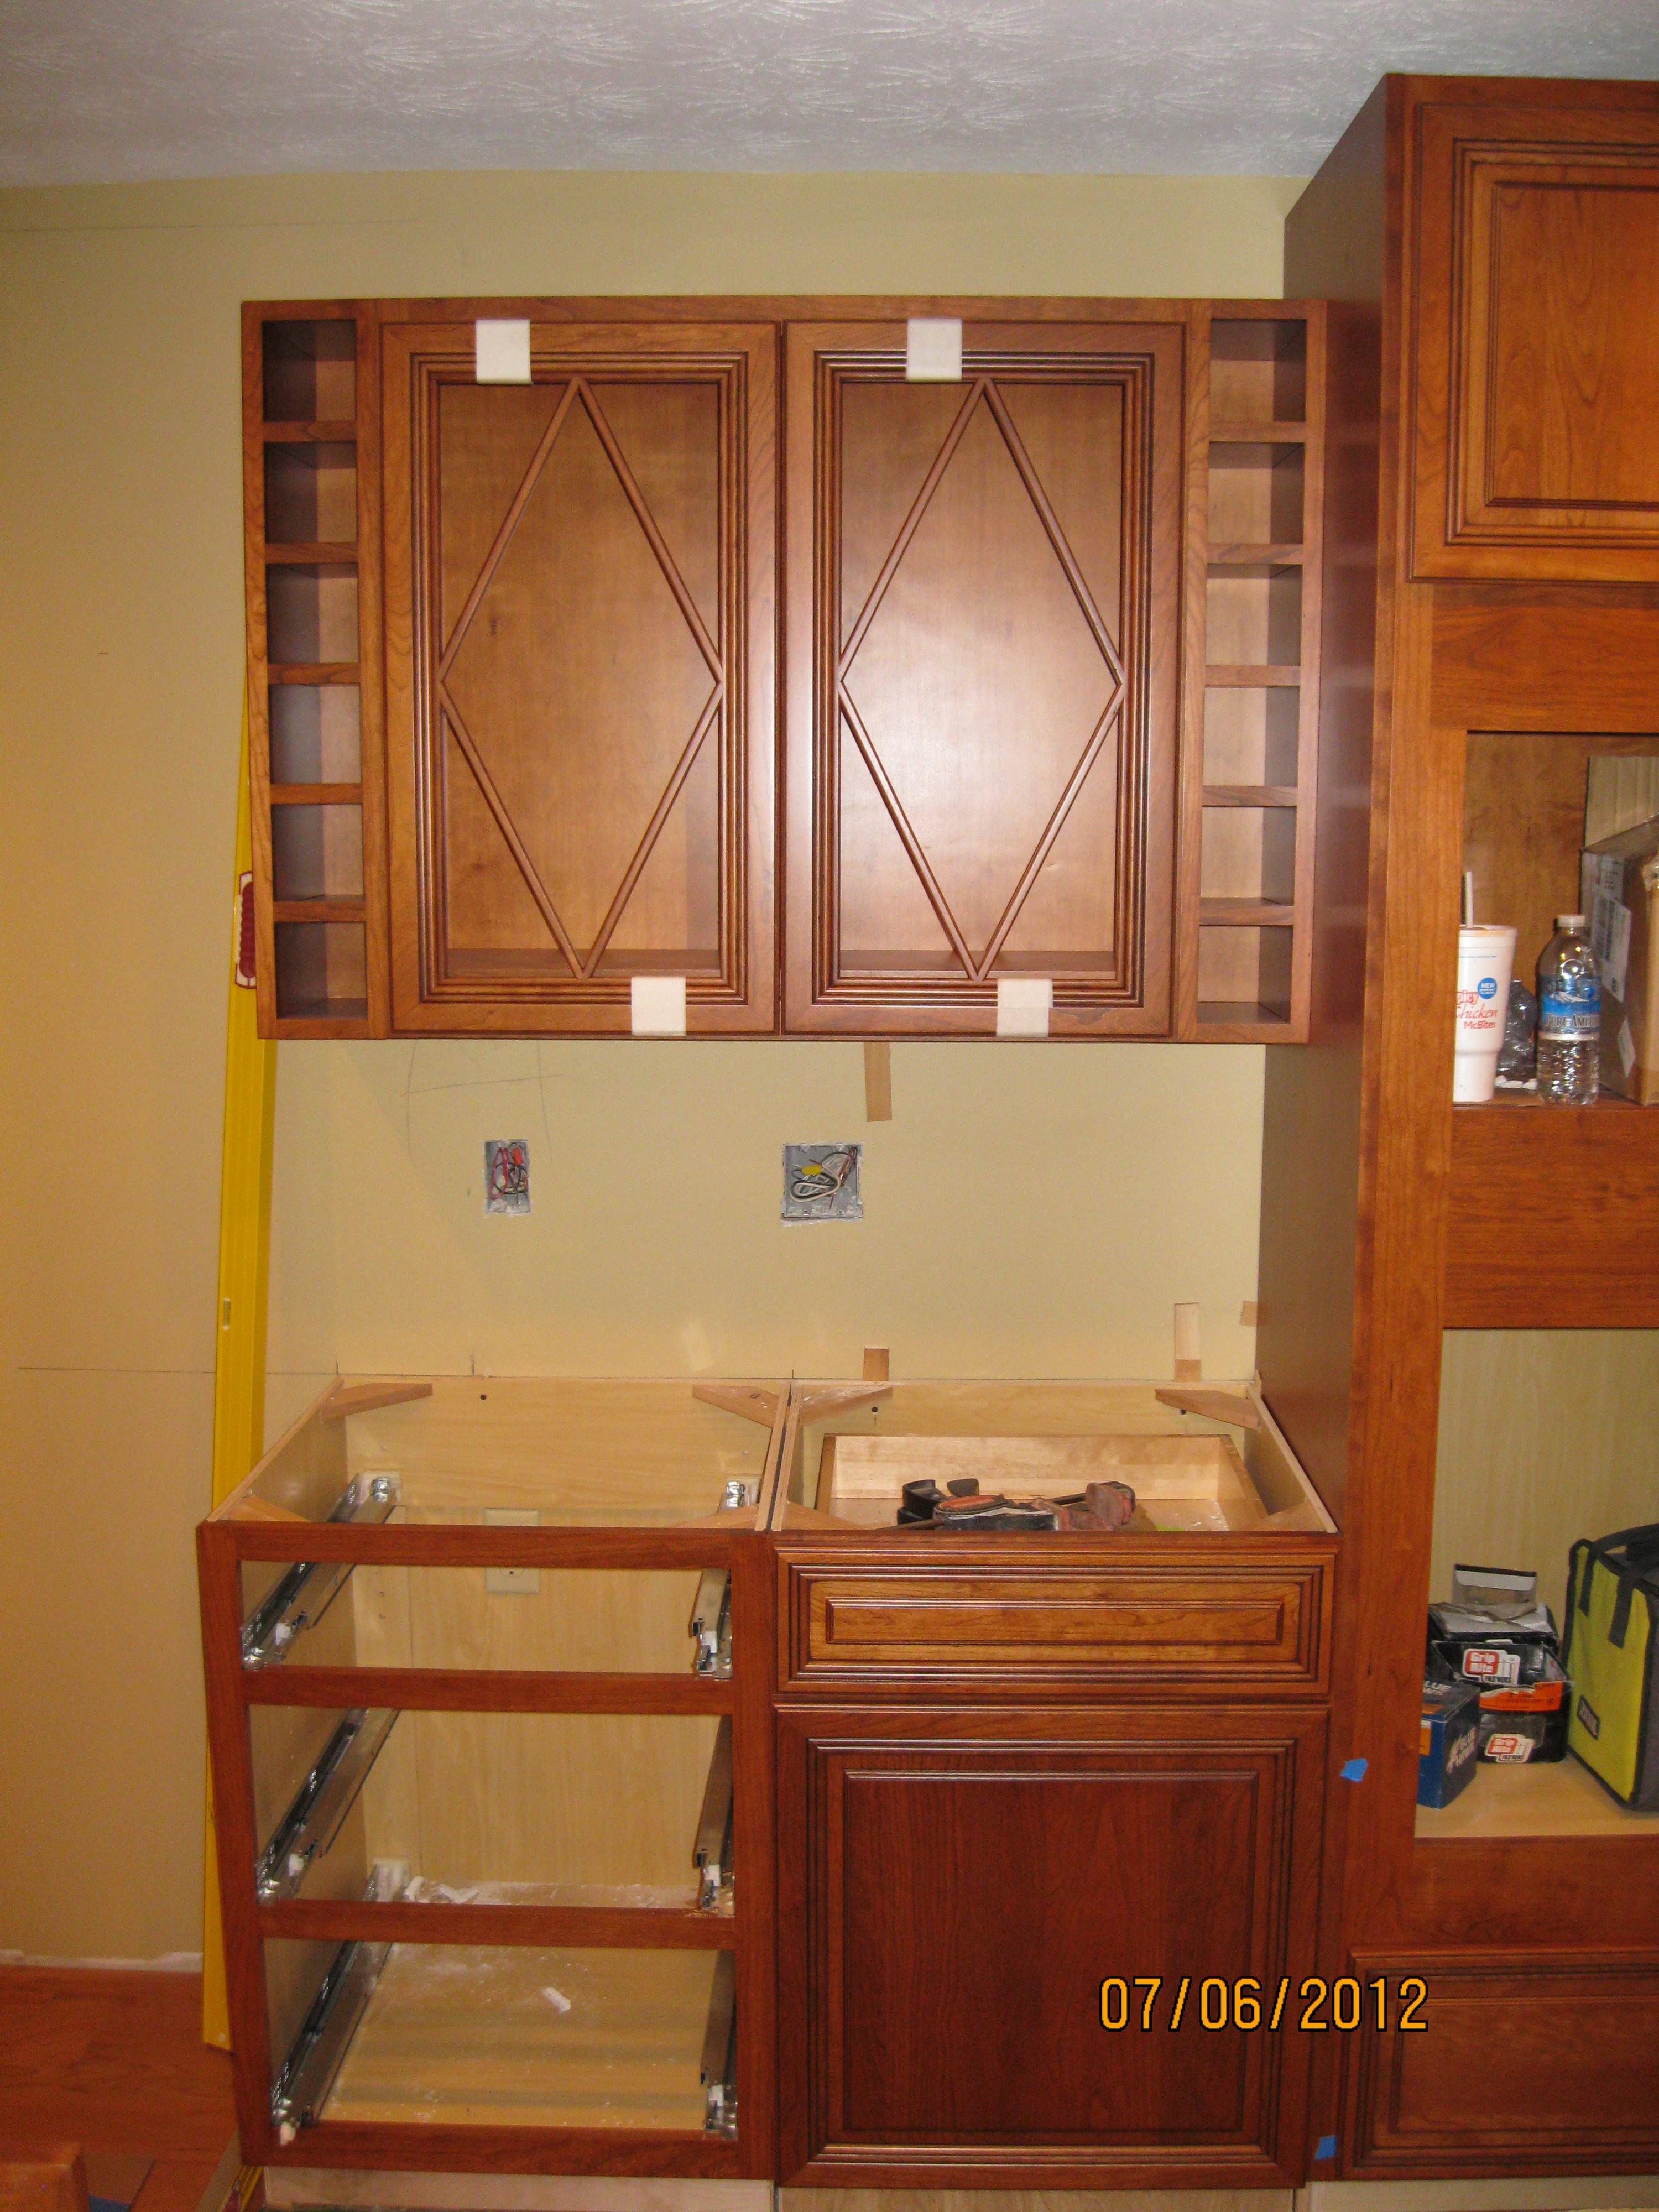 beavercreek kitchen cabinets